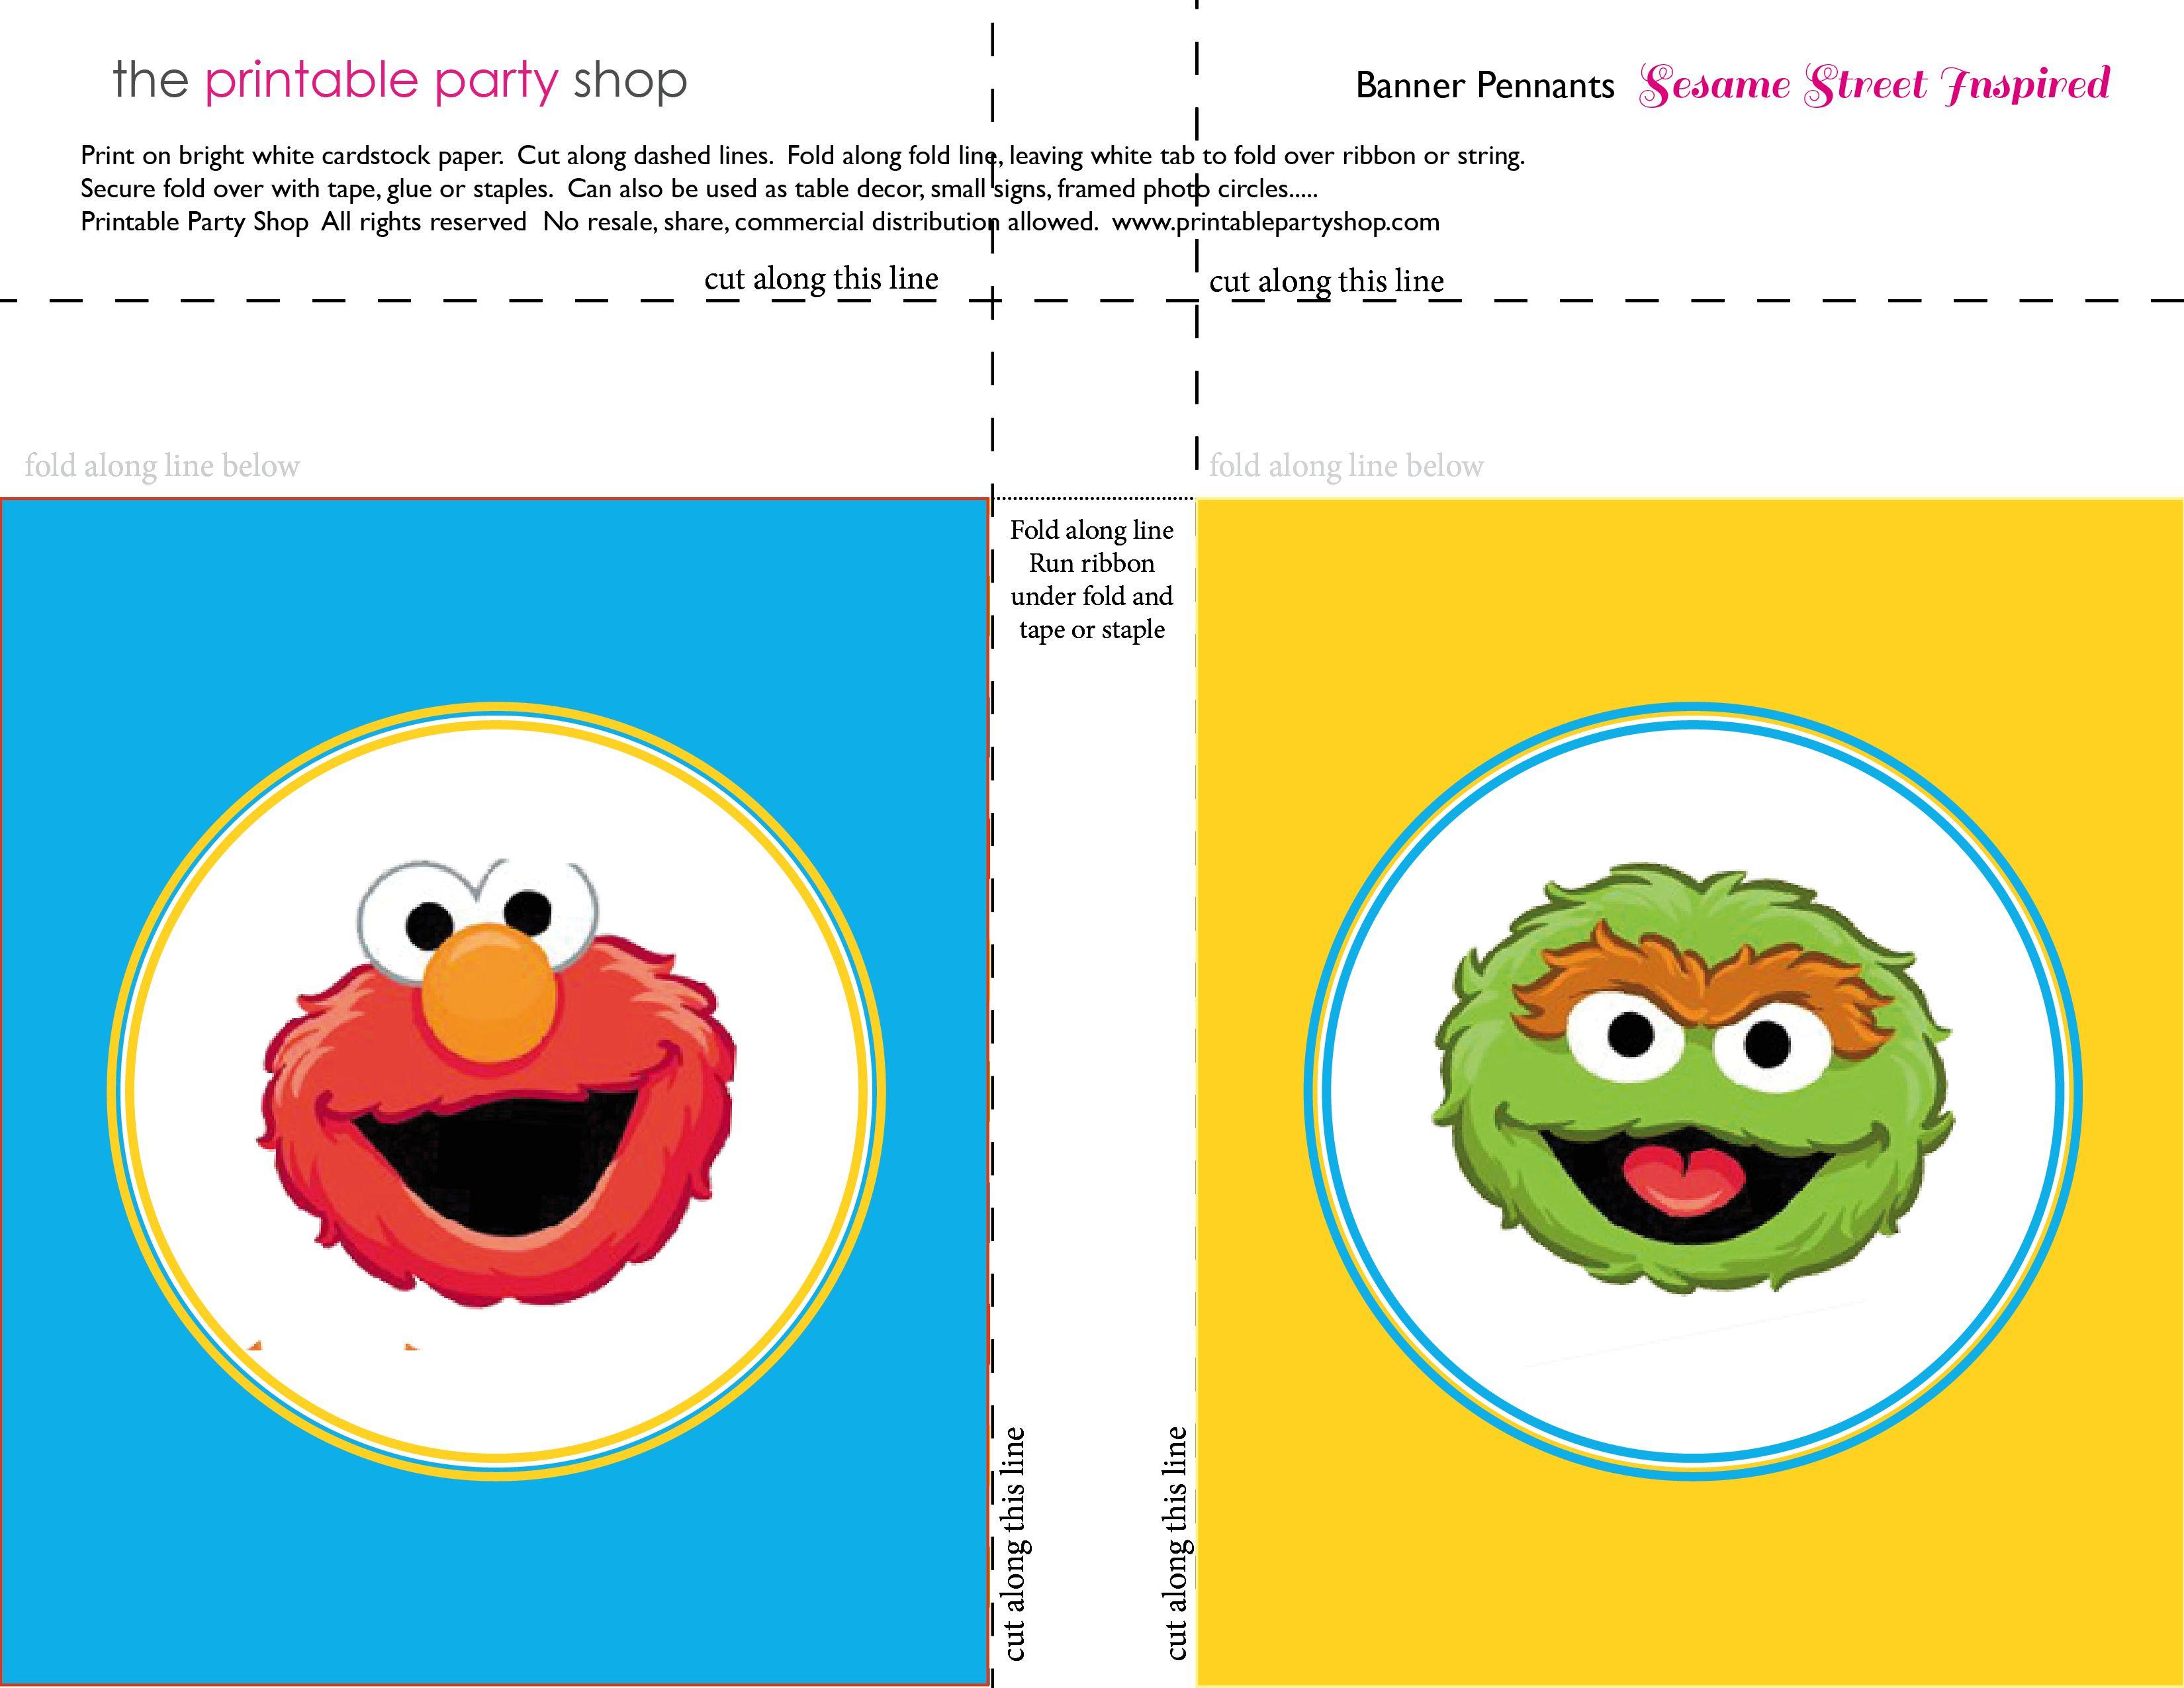 Elmo printables free banner squares elmo oscar sesame street elmo printables free banner squares elmo oscar sesame street pronofoot35fo Choice Image